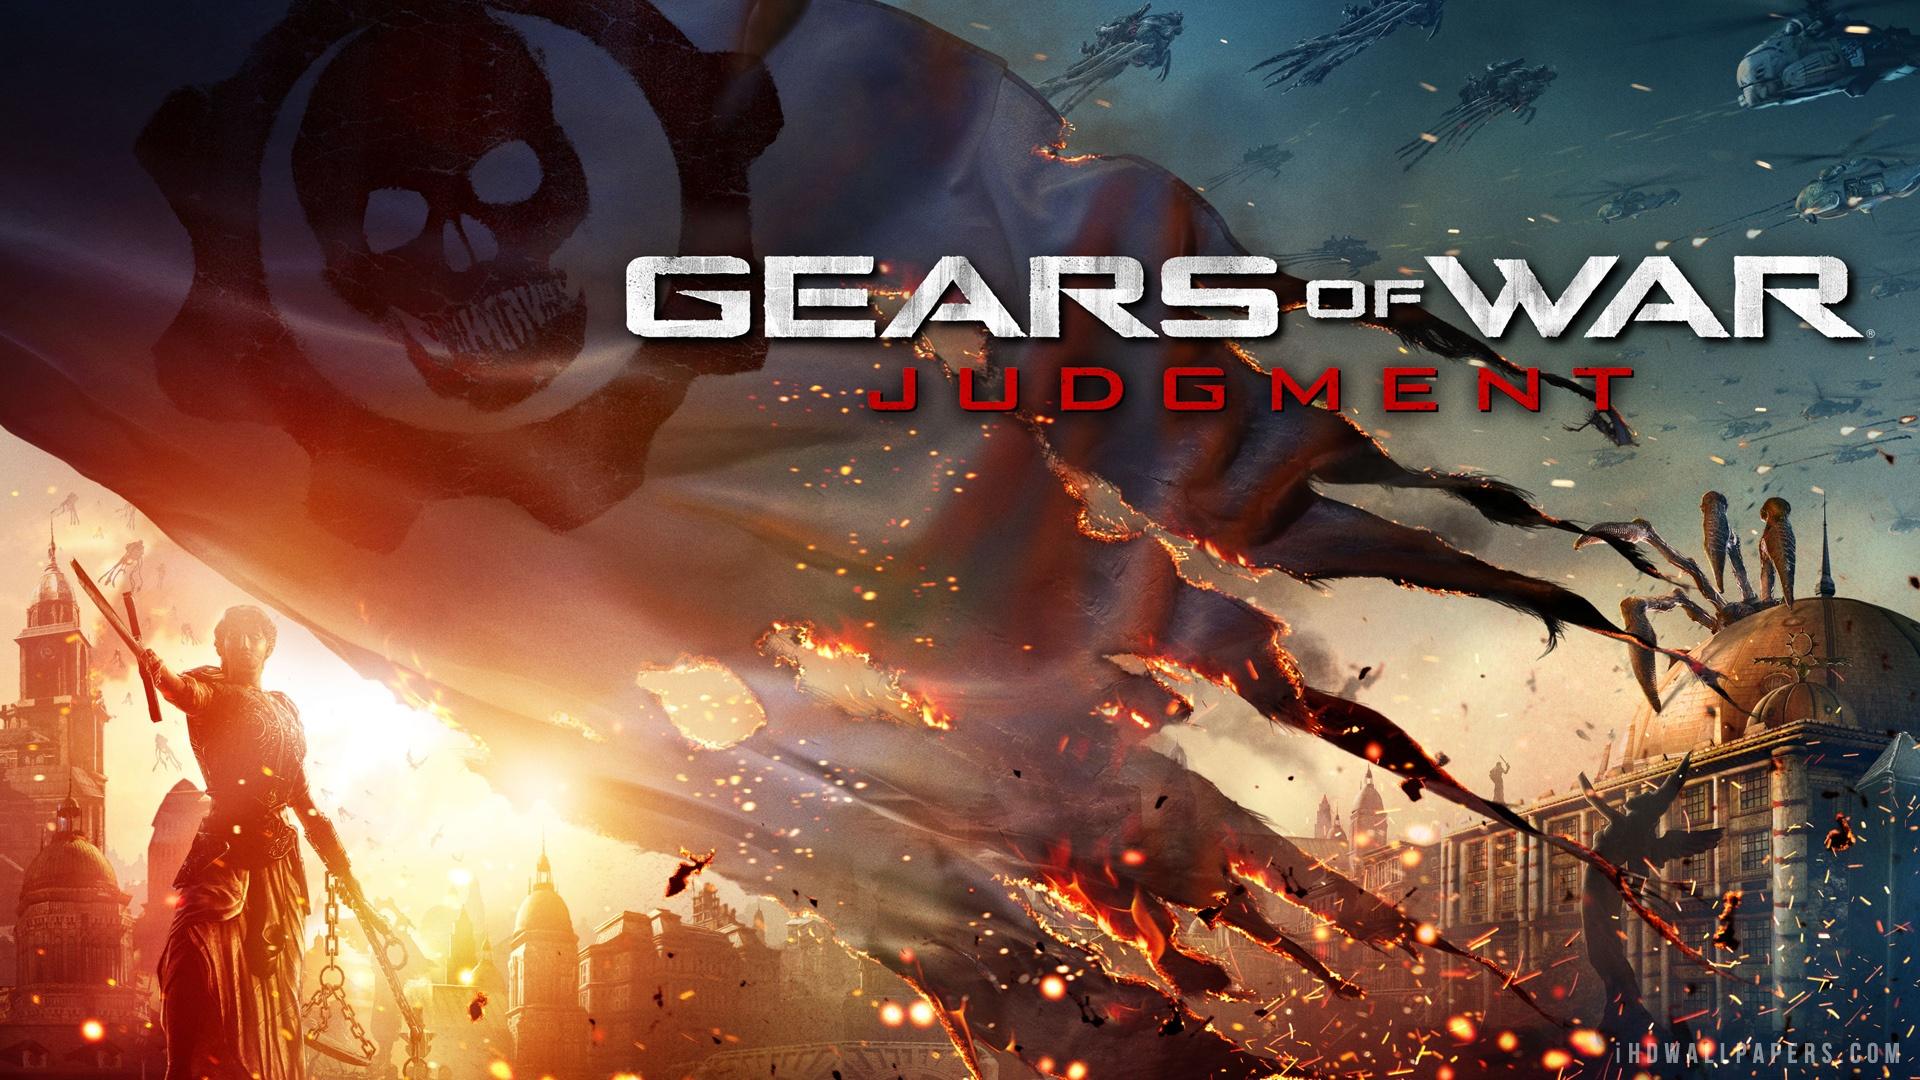 Gears of War Judgment Game HD Wallpaper   iHD Wallpapers 1920x1080